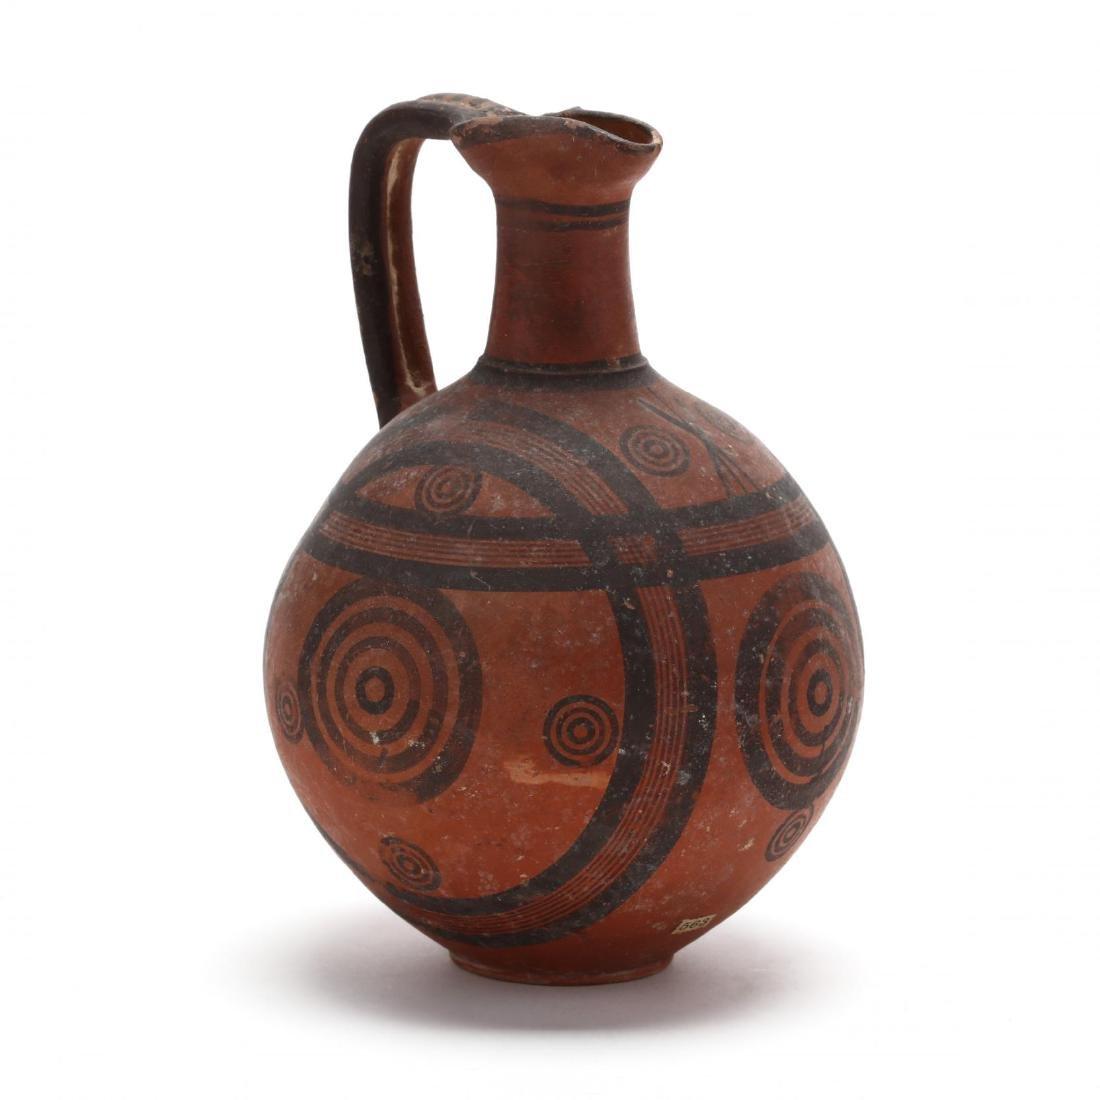 Cypro-Archaic Red Ware Jug, Ex. Cesnola Collection